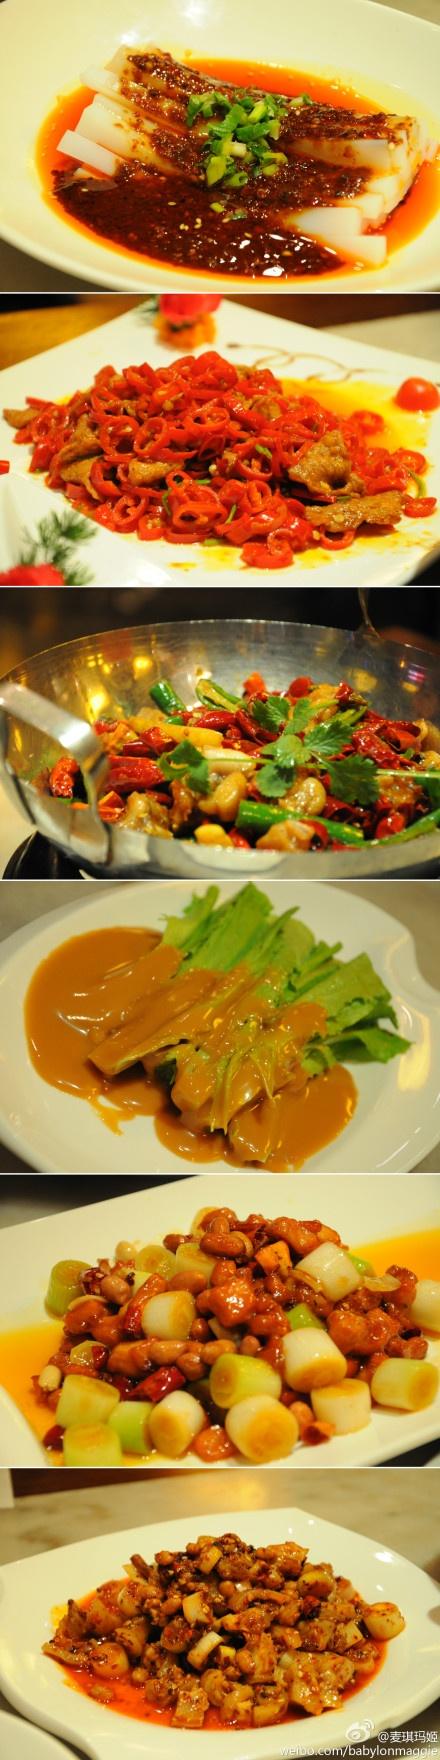 Family style asian dish hotpot